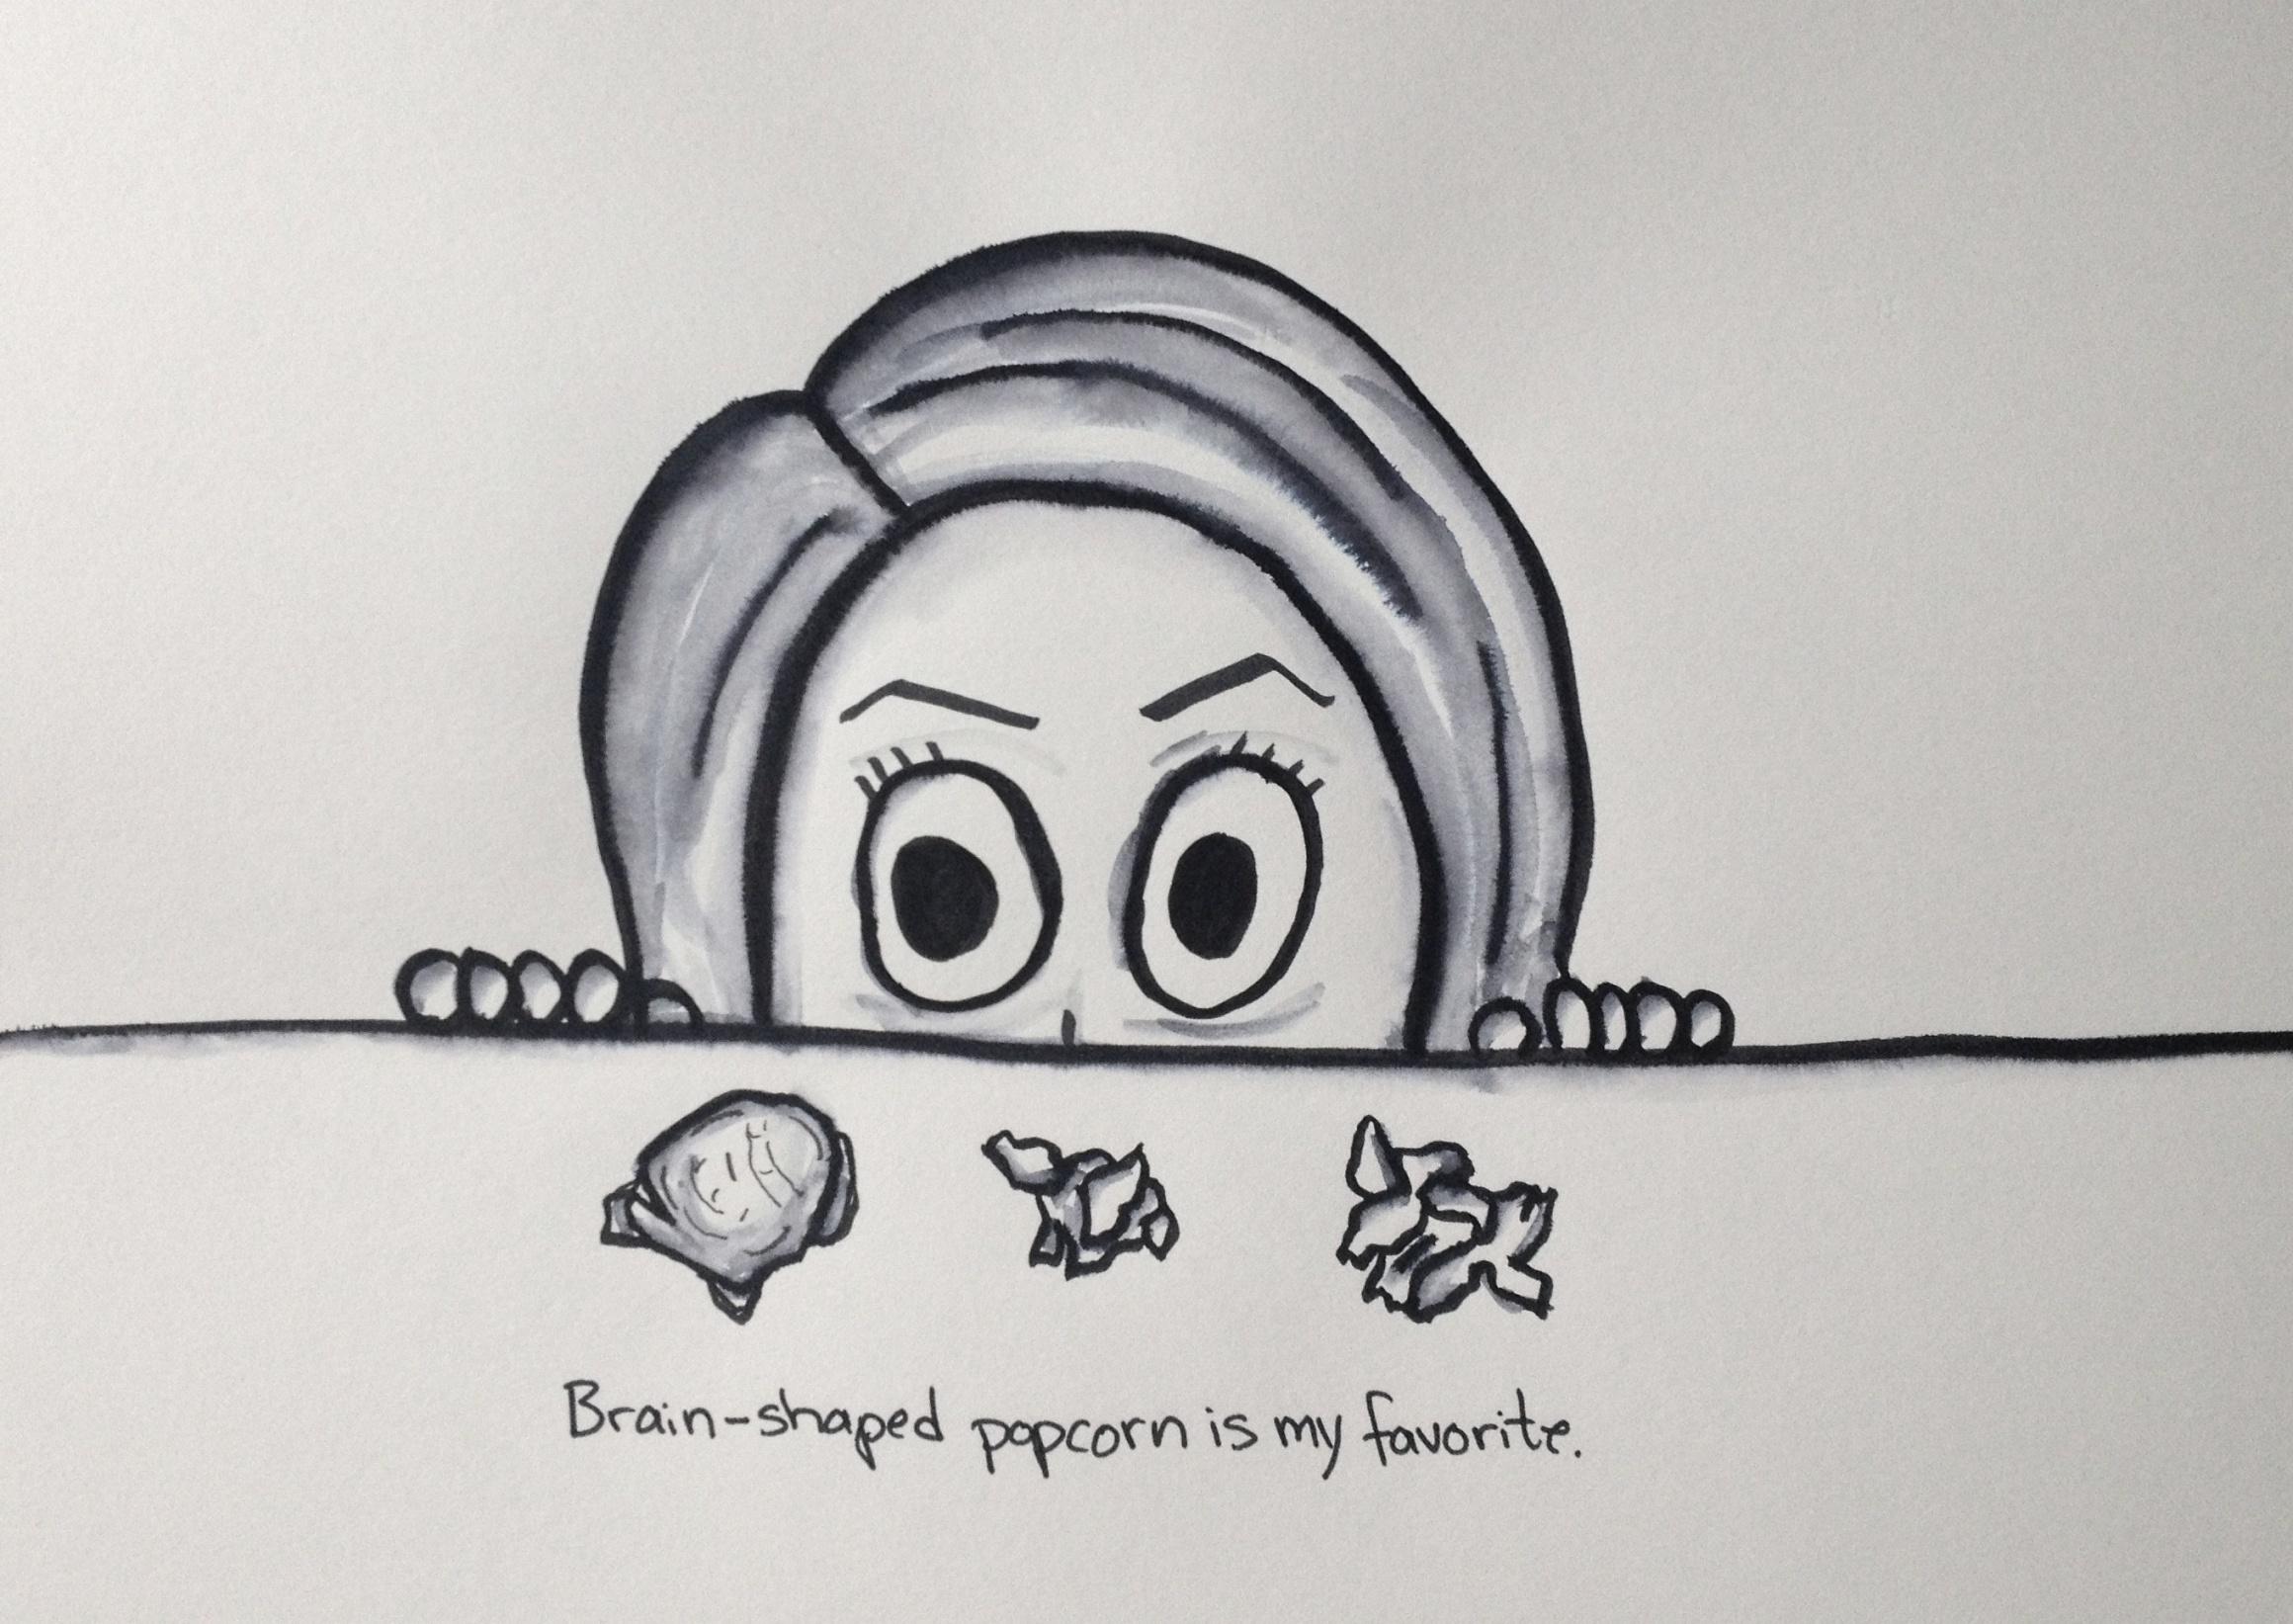 Brain-shpaed popcorn